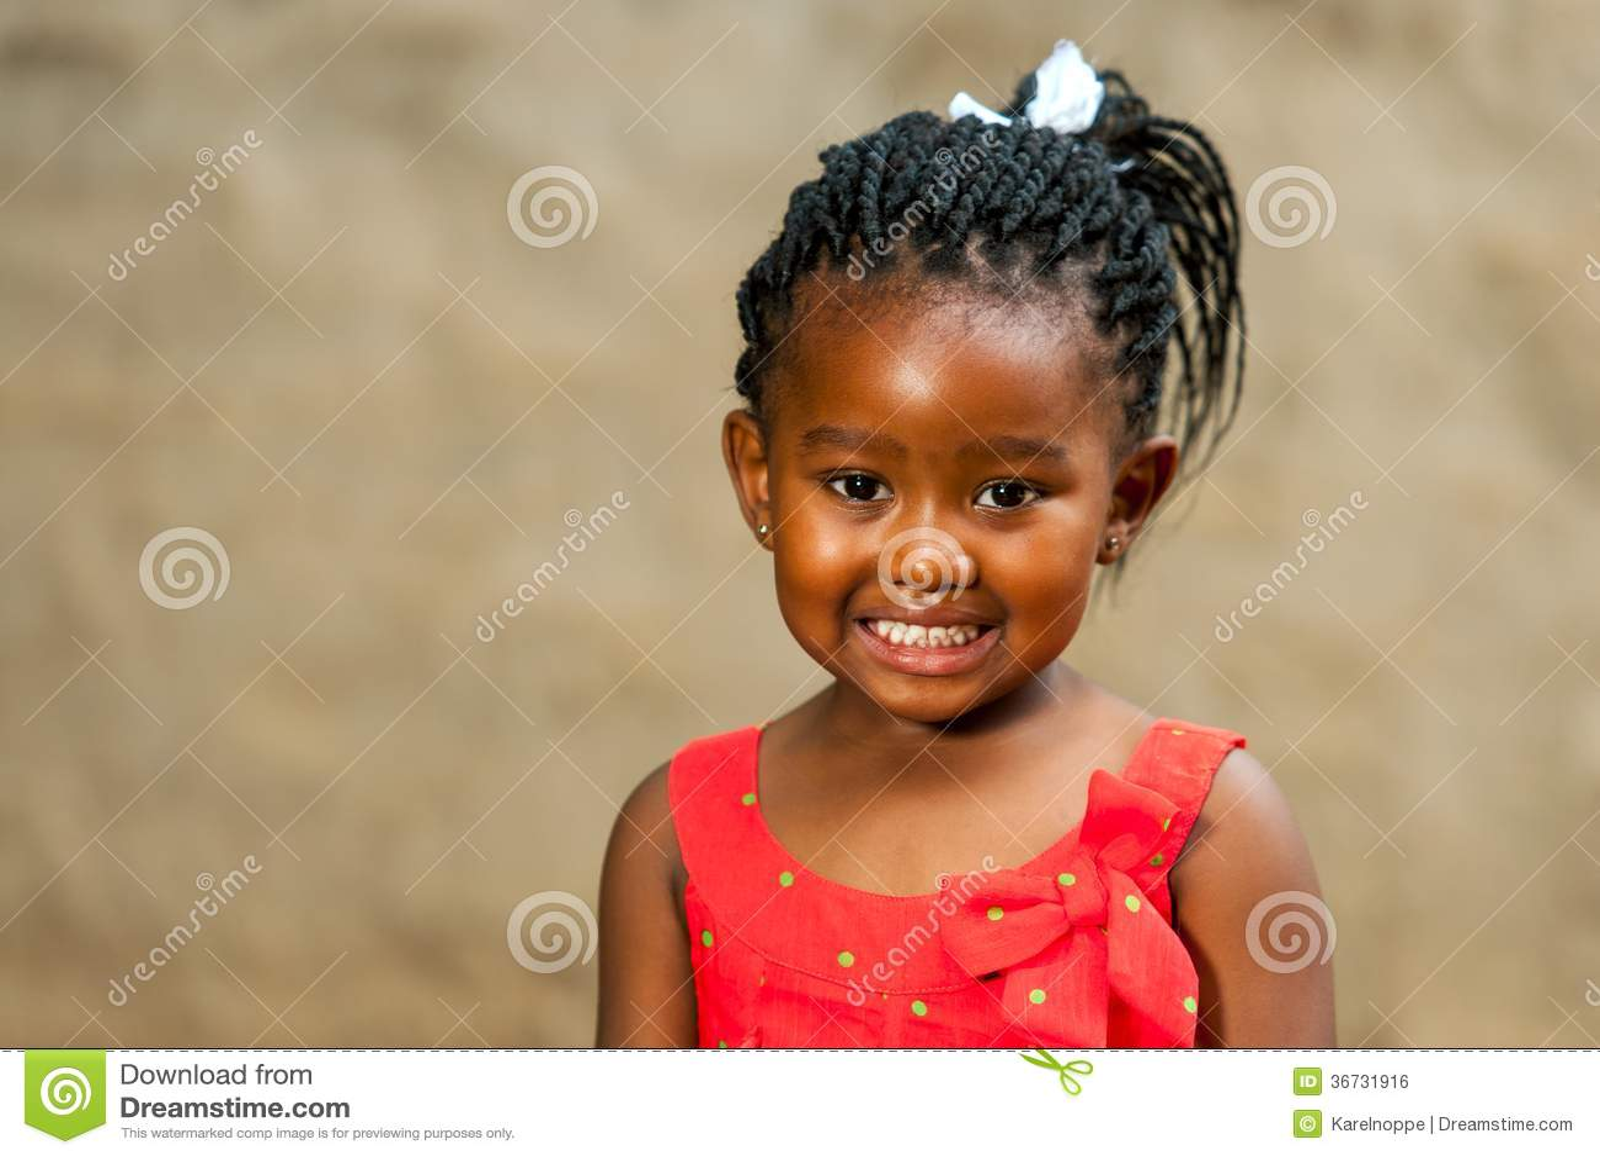 petite fille africaine avec la coiffure tress e image. Black Bedroom Furniture Sets. Home Design Ideas